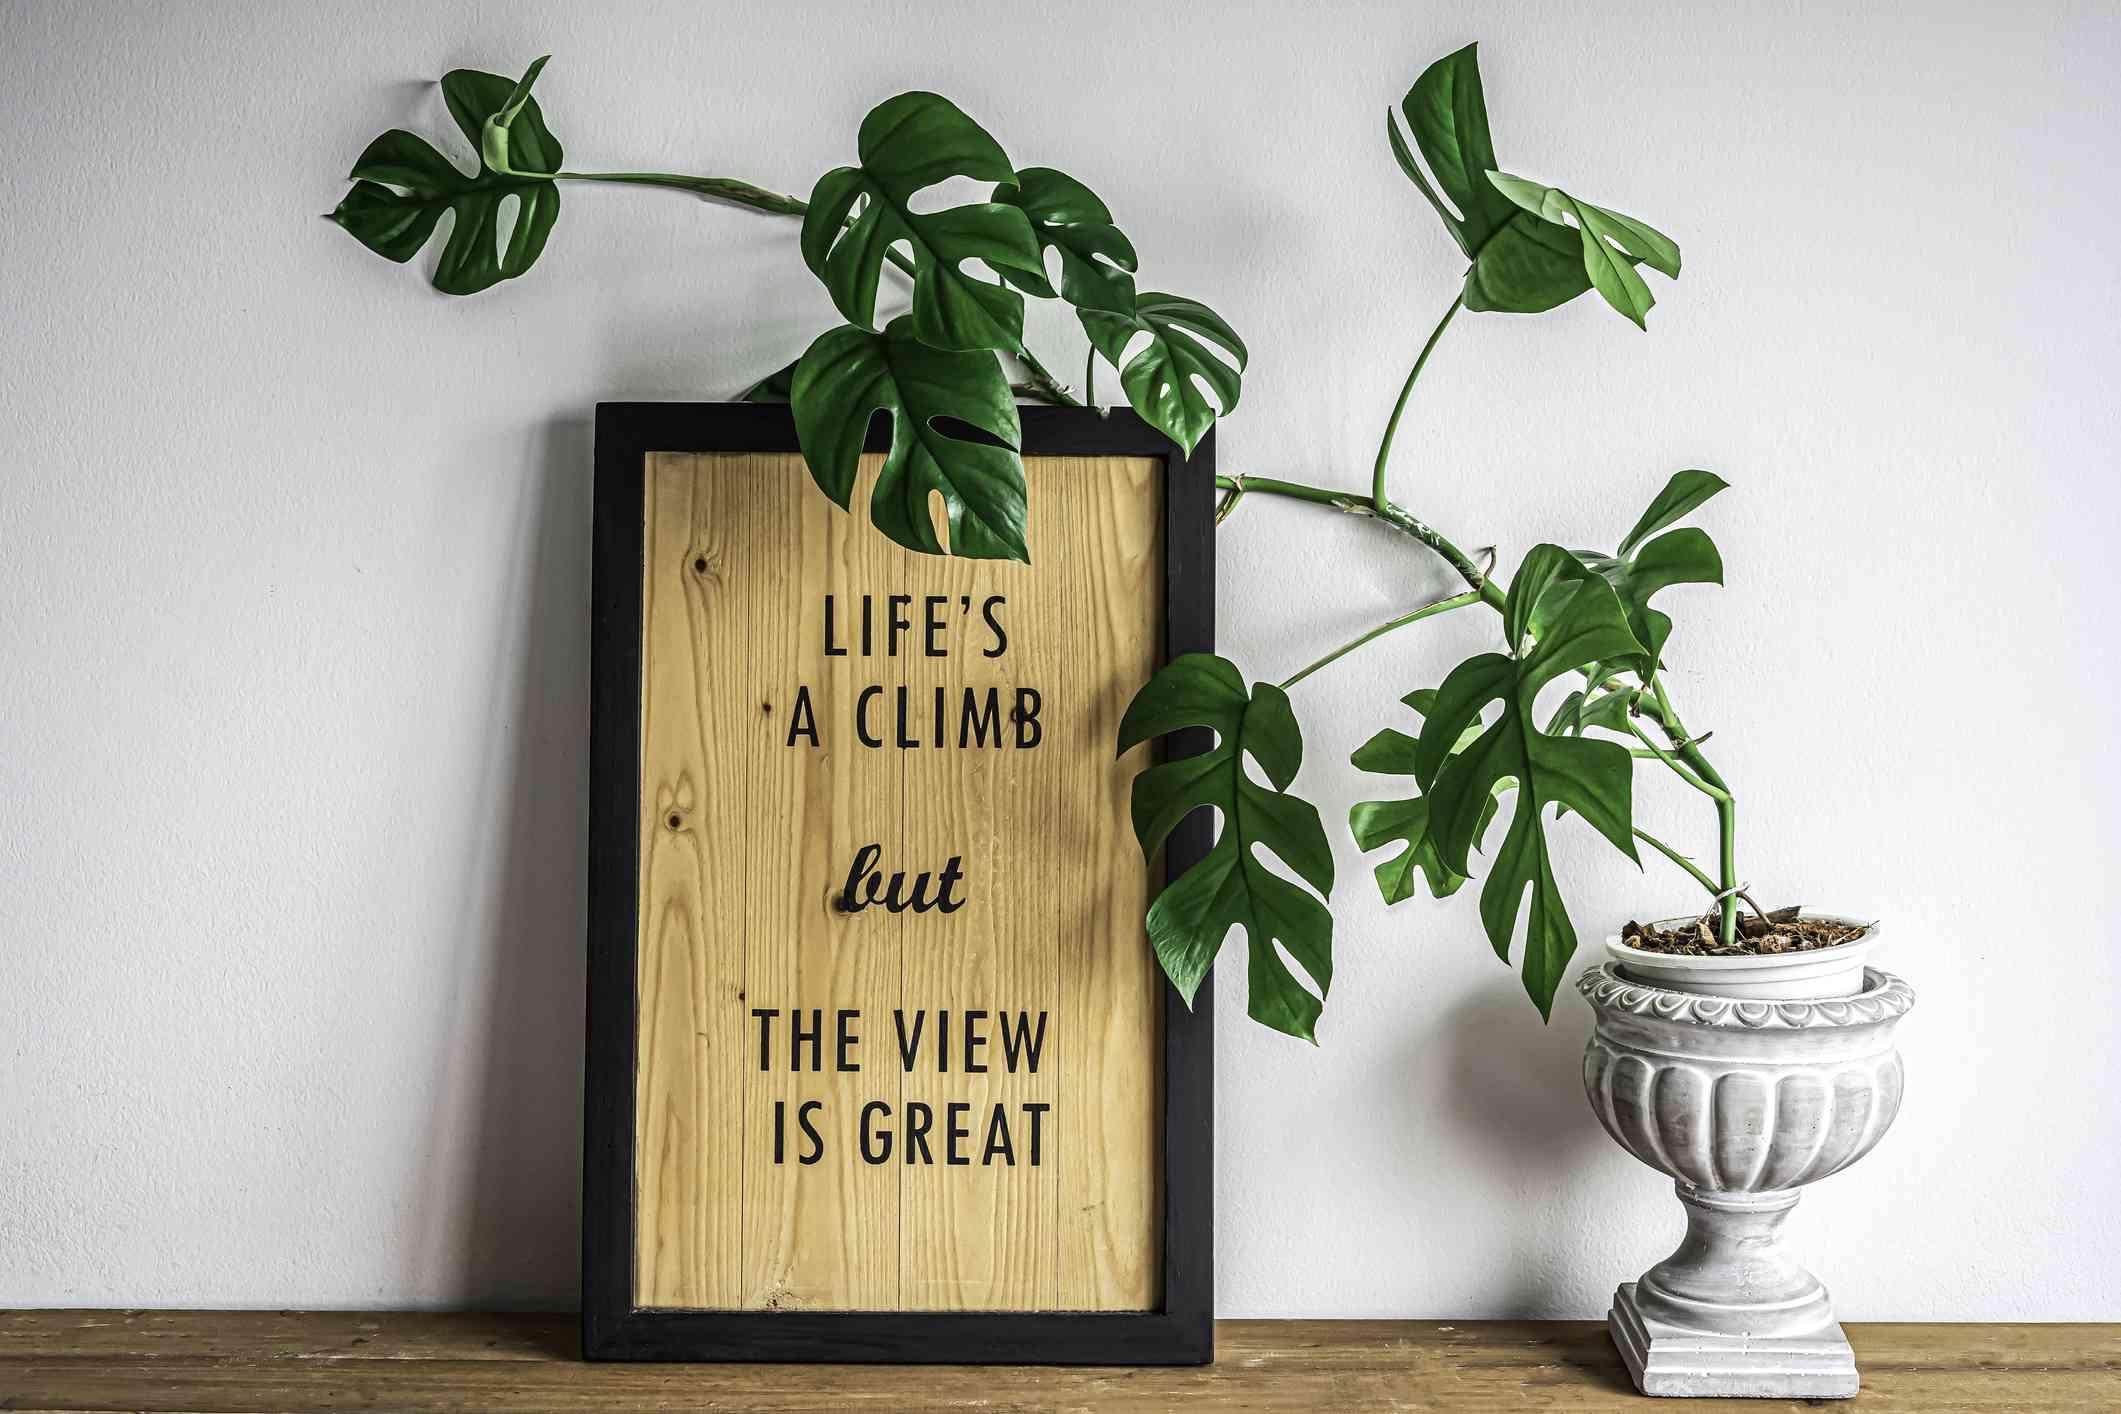 Rhaphidophora plant leans against picture frame